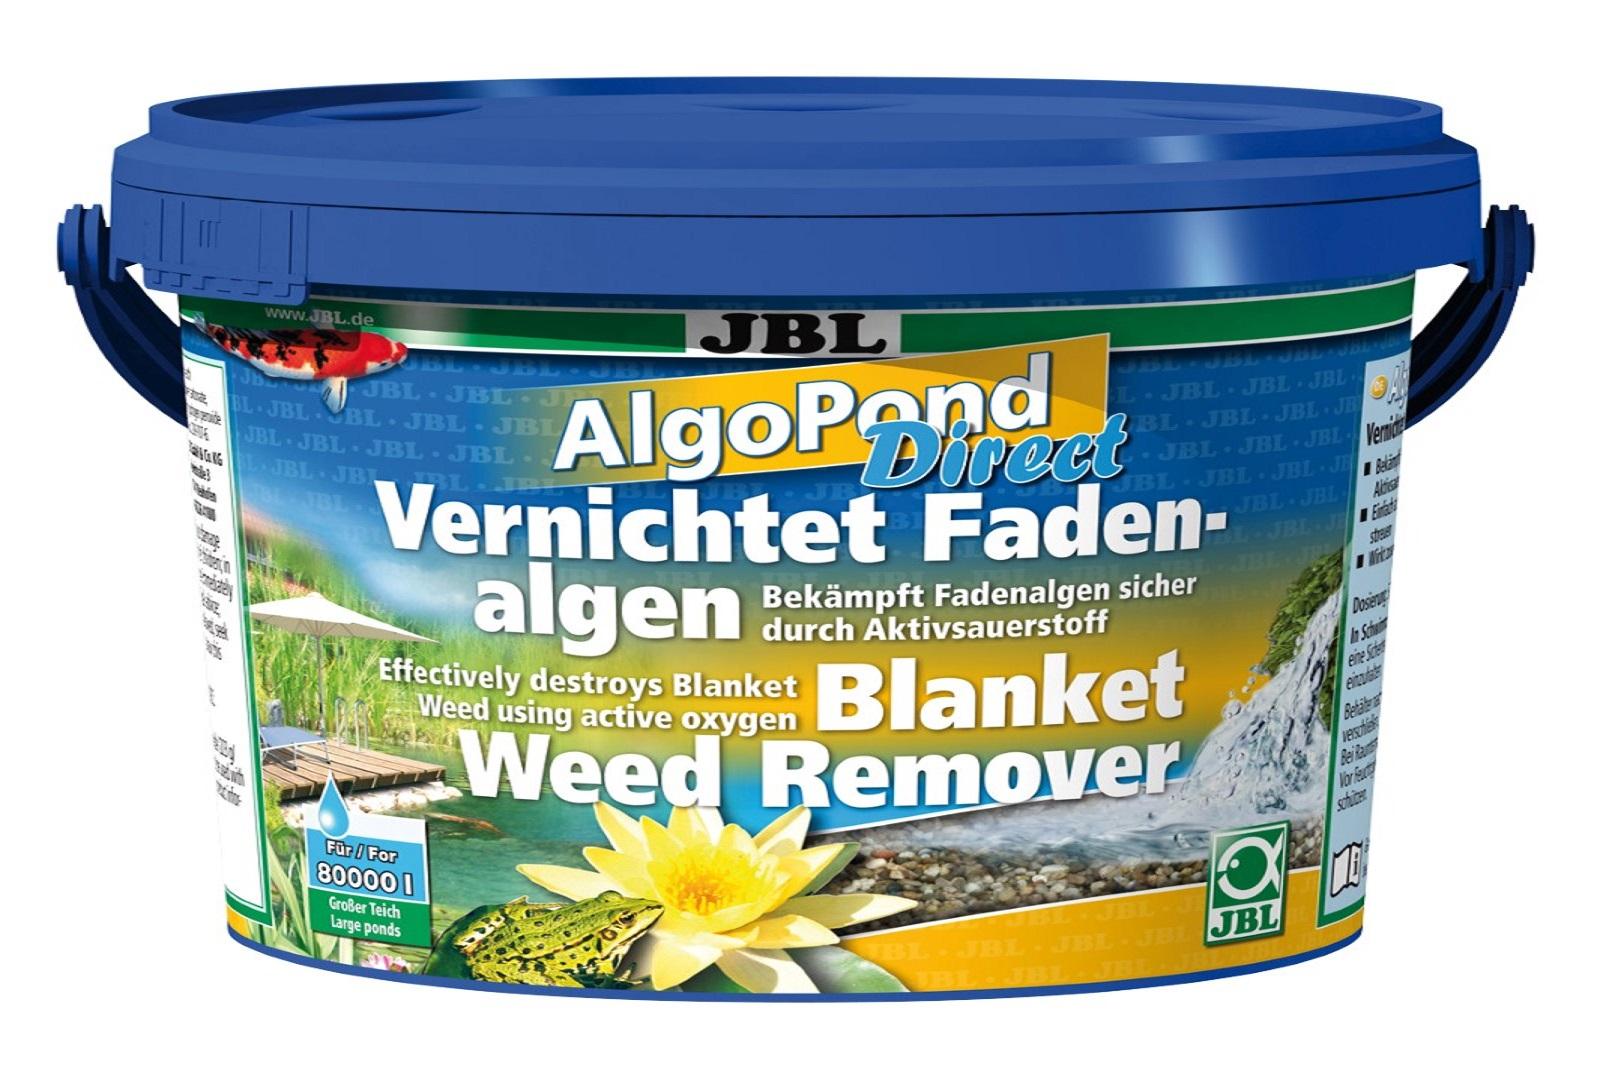 JBL AlgoPond Direct 2,5 kg   vernichtet  Fadenalgen